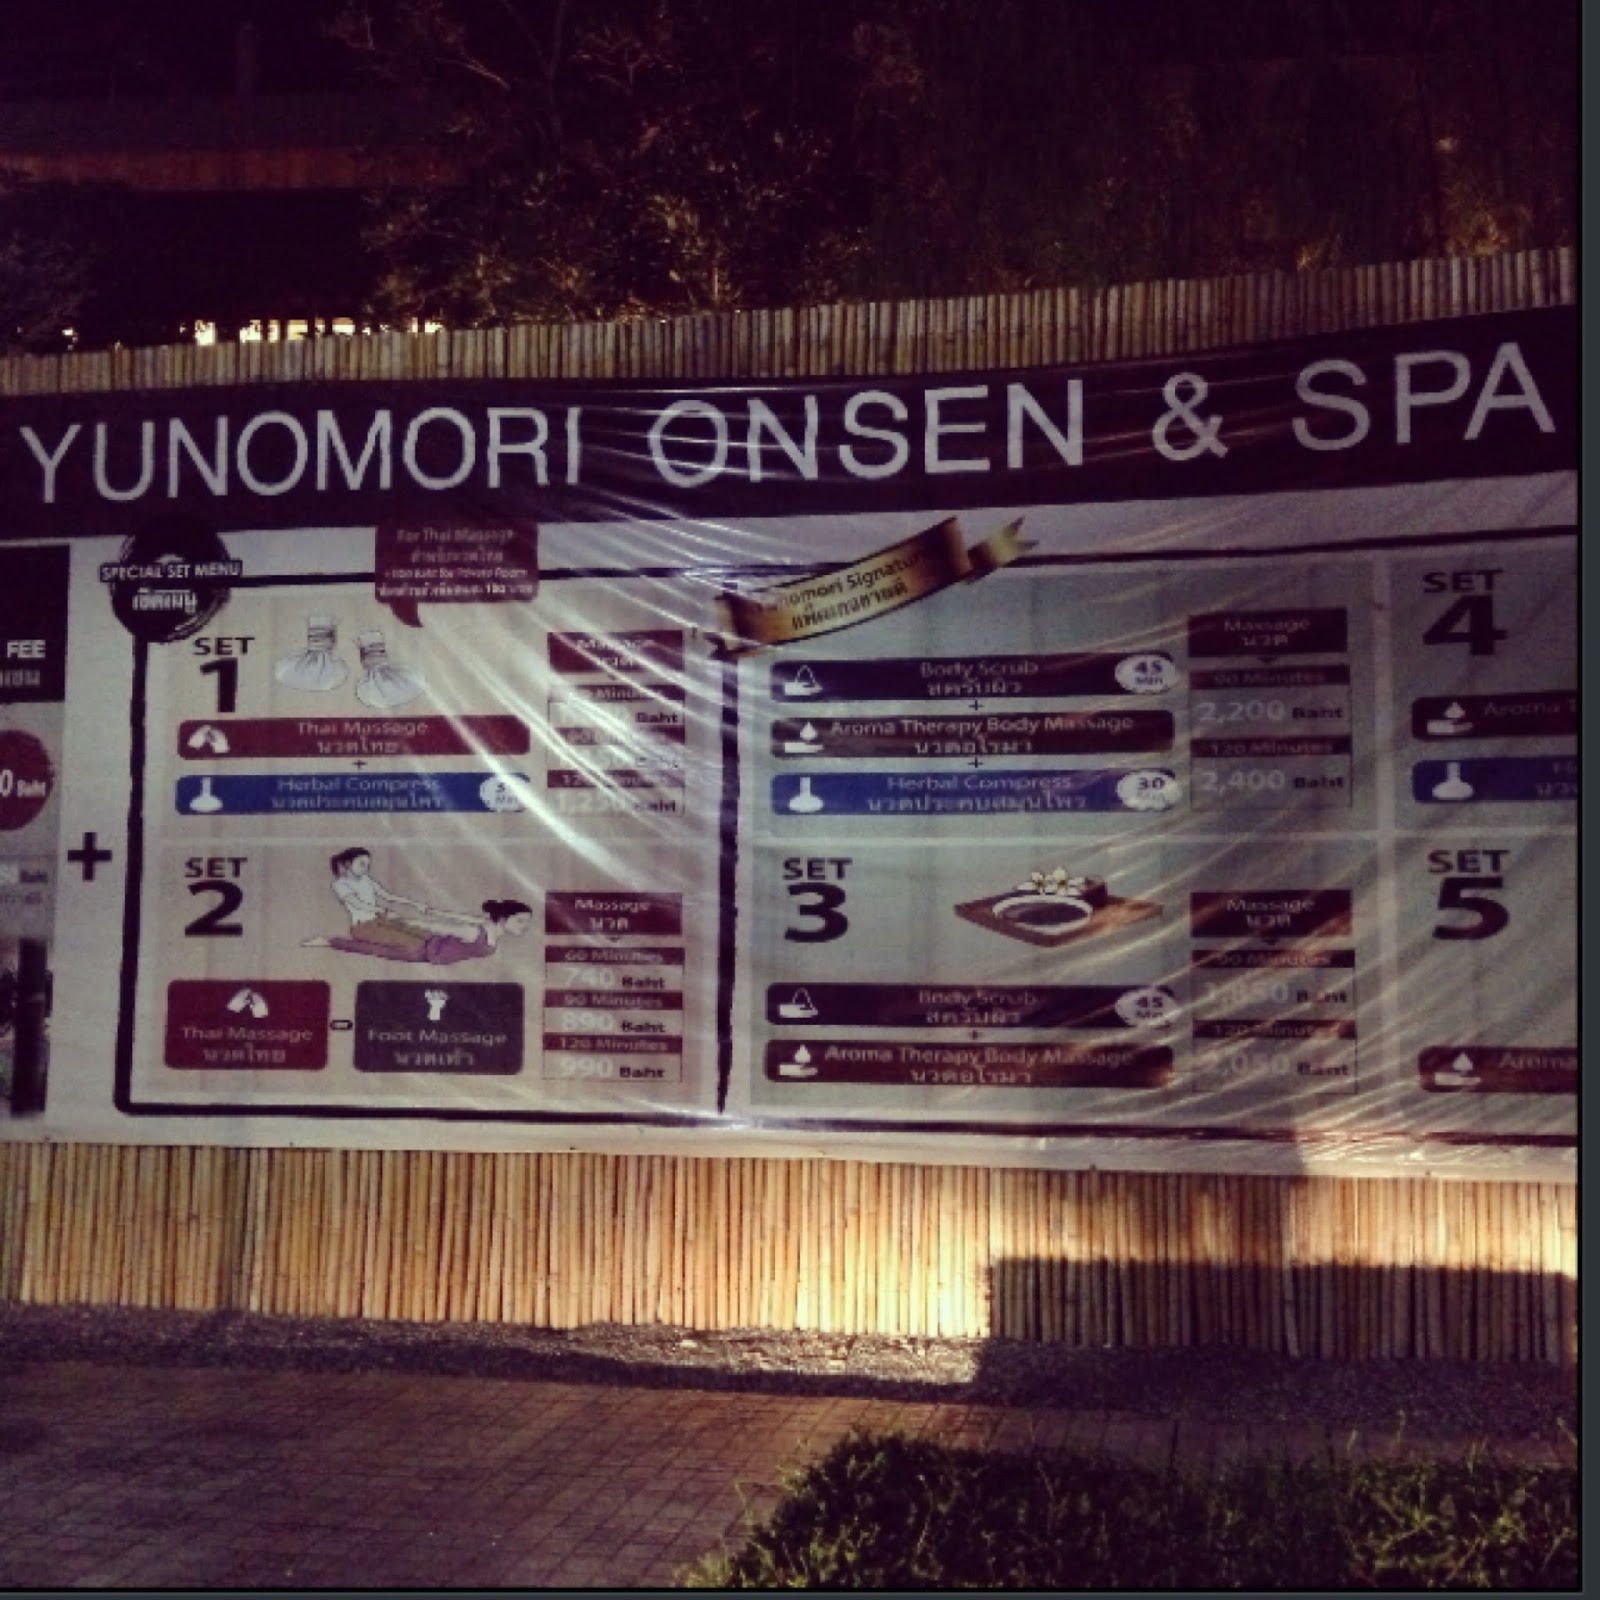 Yunomori Onsen and spa menu